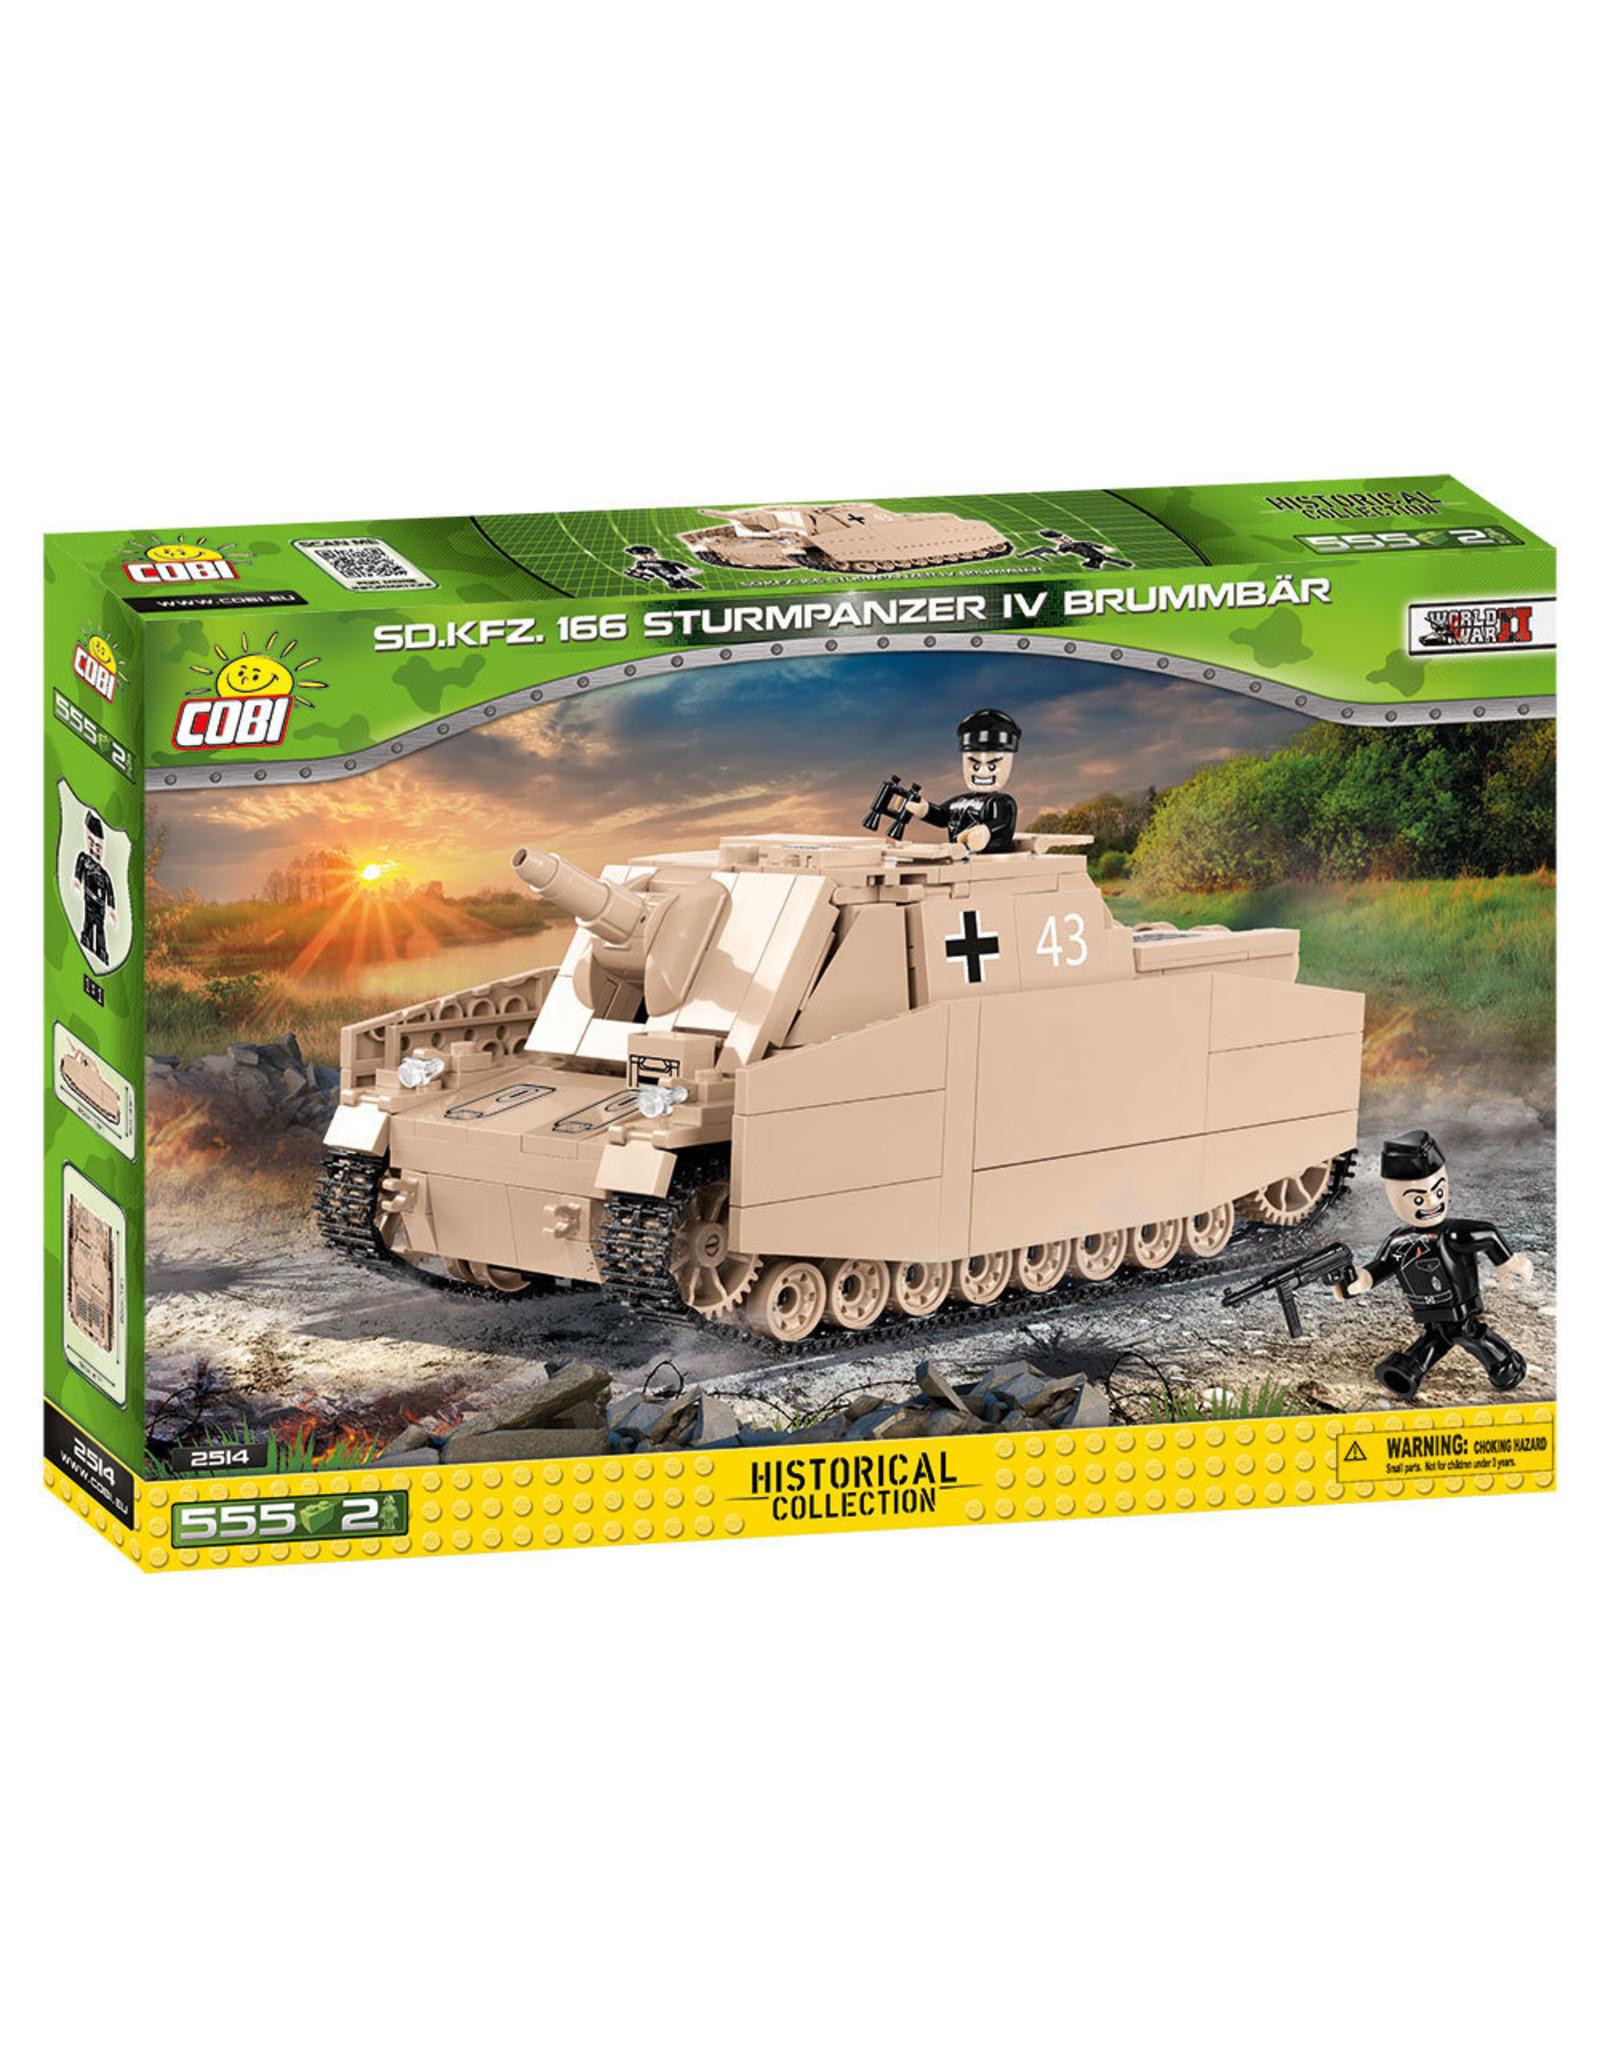 COBI COBI WW2 2514 - SD.KFZ166 Sturmpanzer IV Brummbar